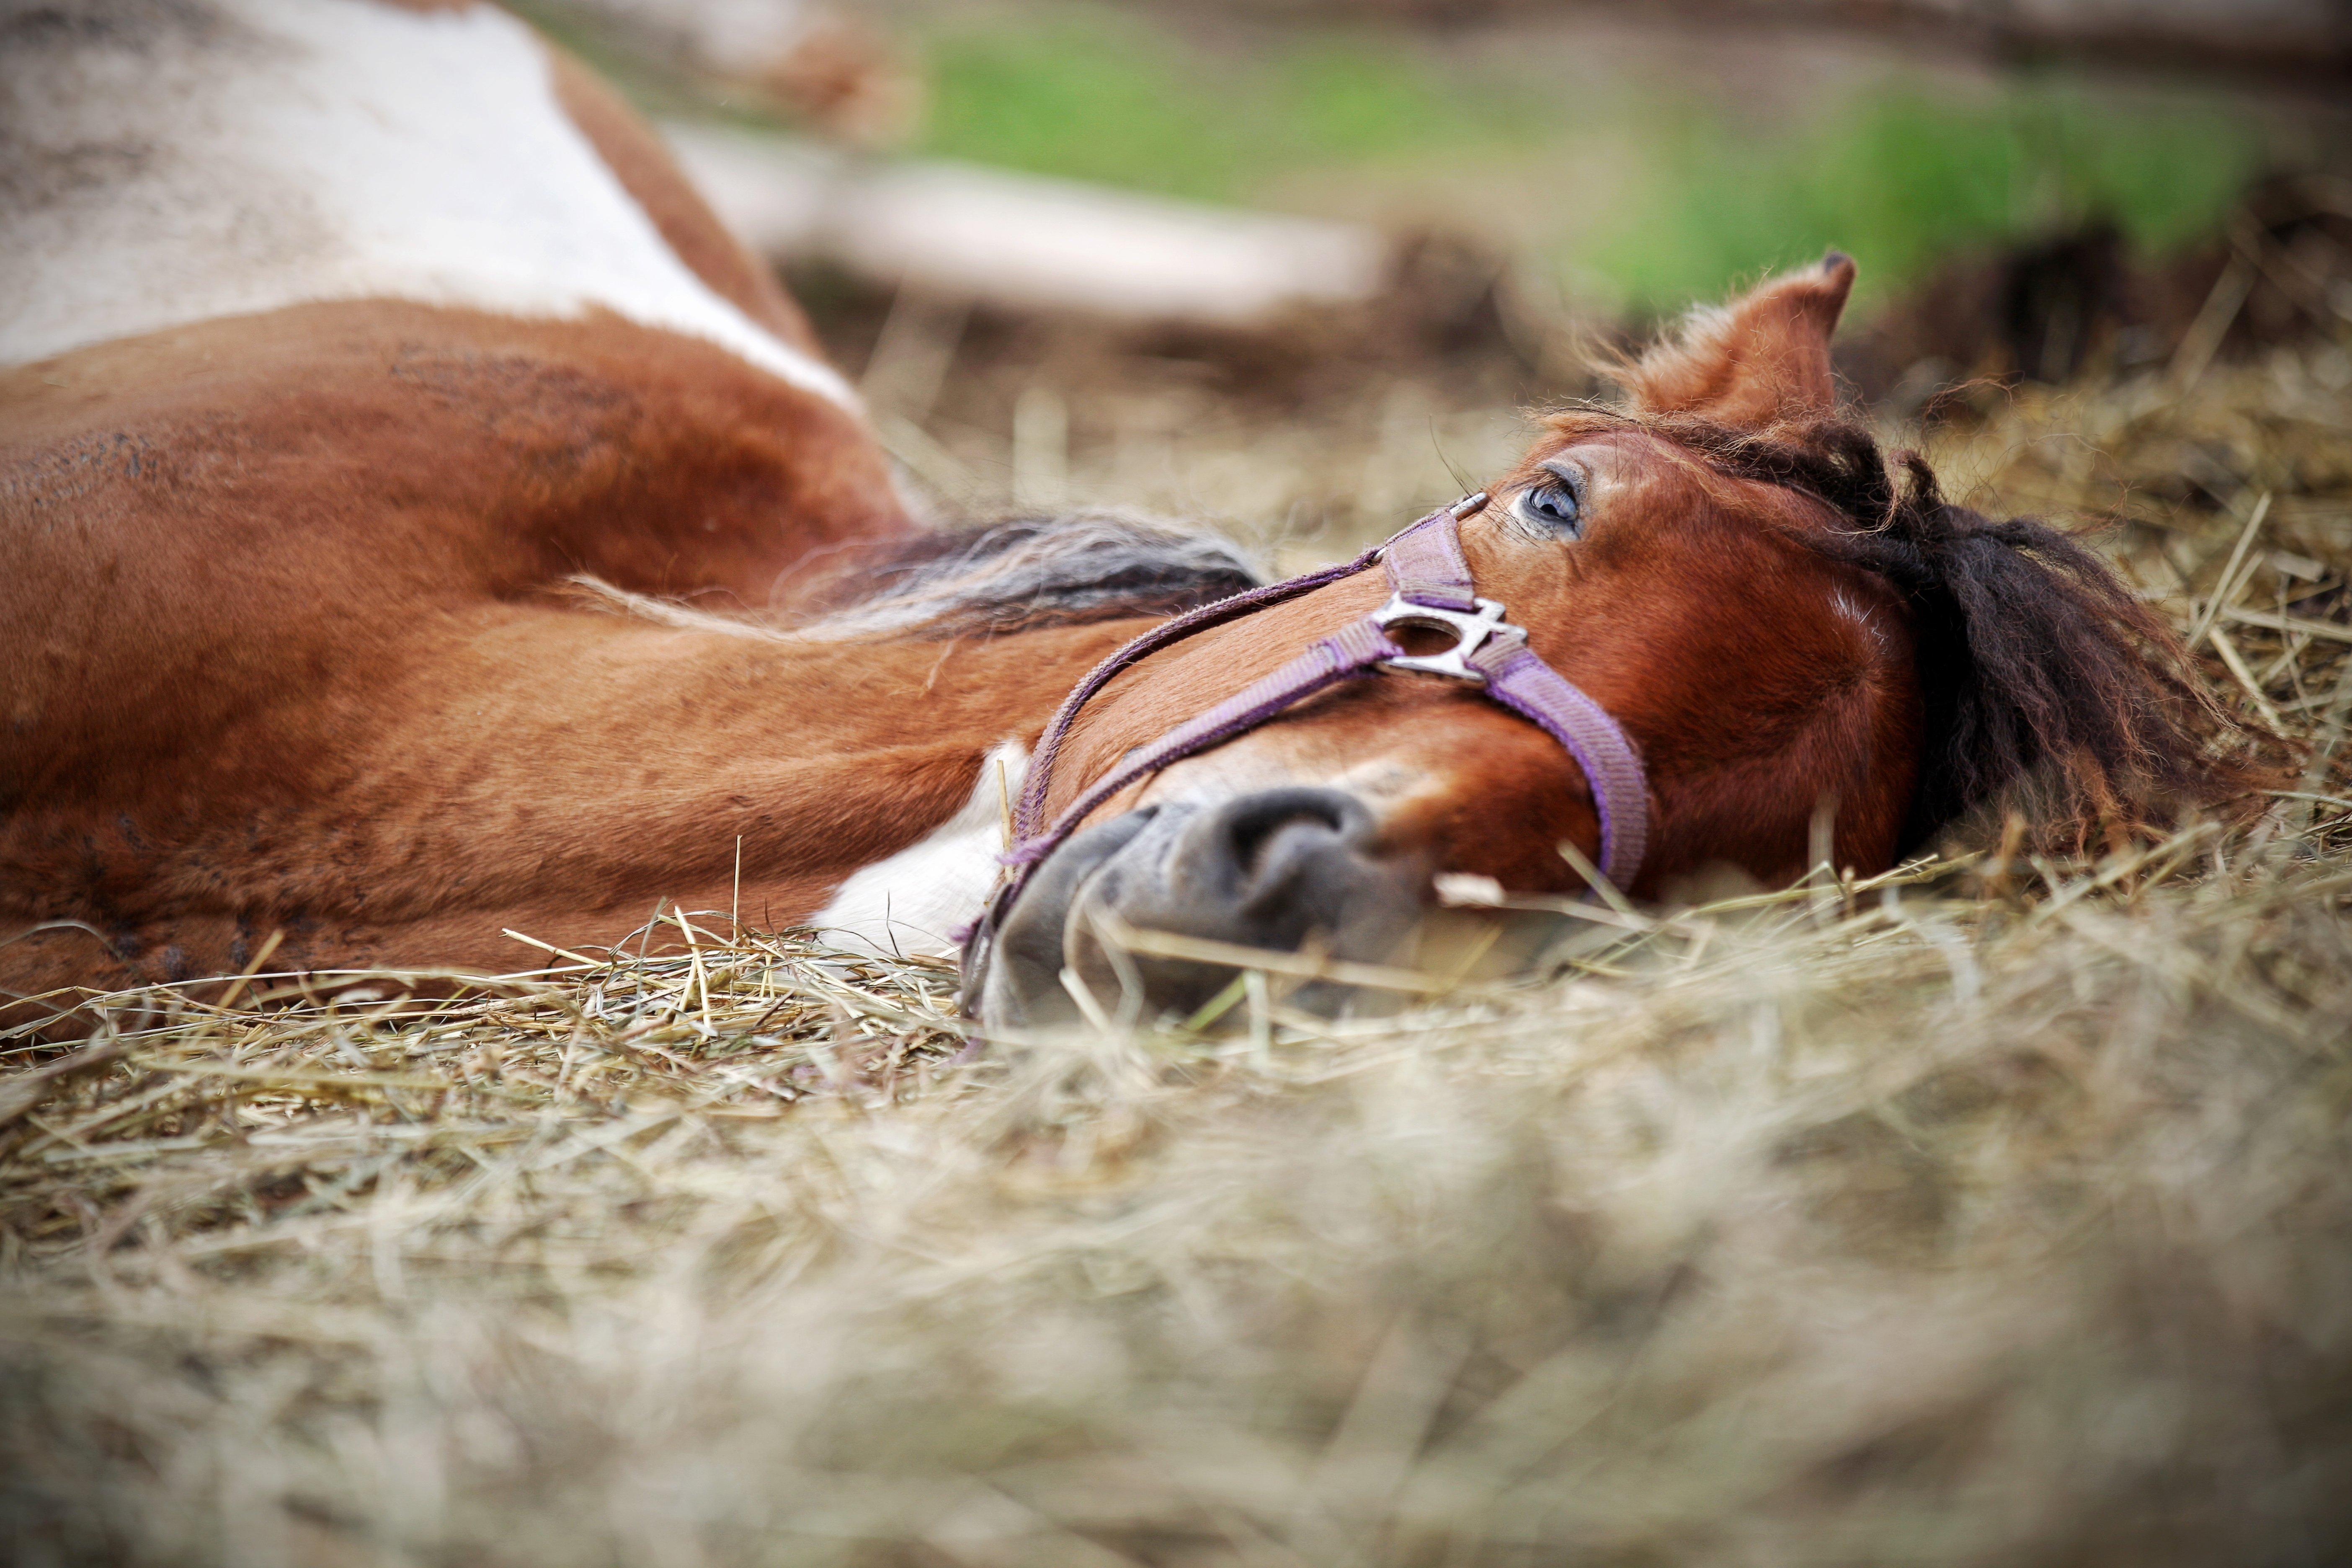 Kolik_Symptom_Magengeschwuer_Pferd